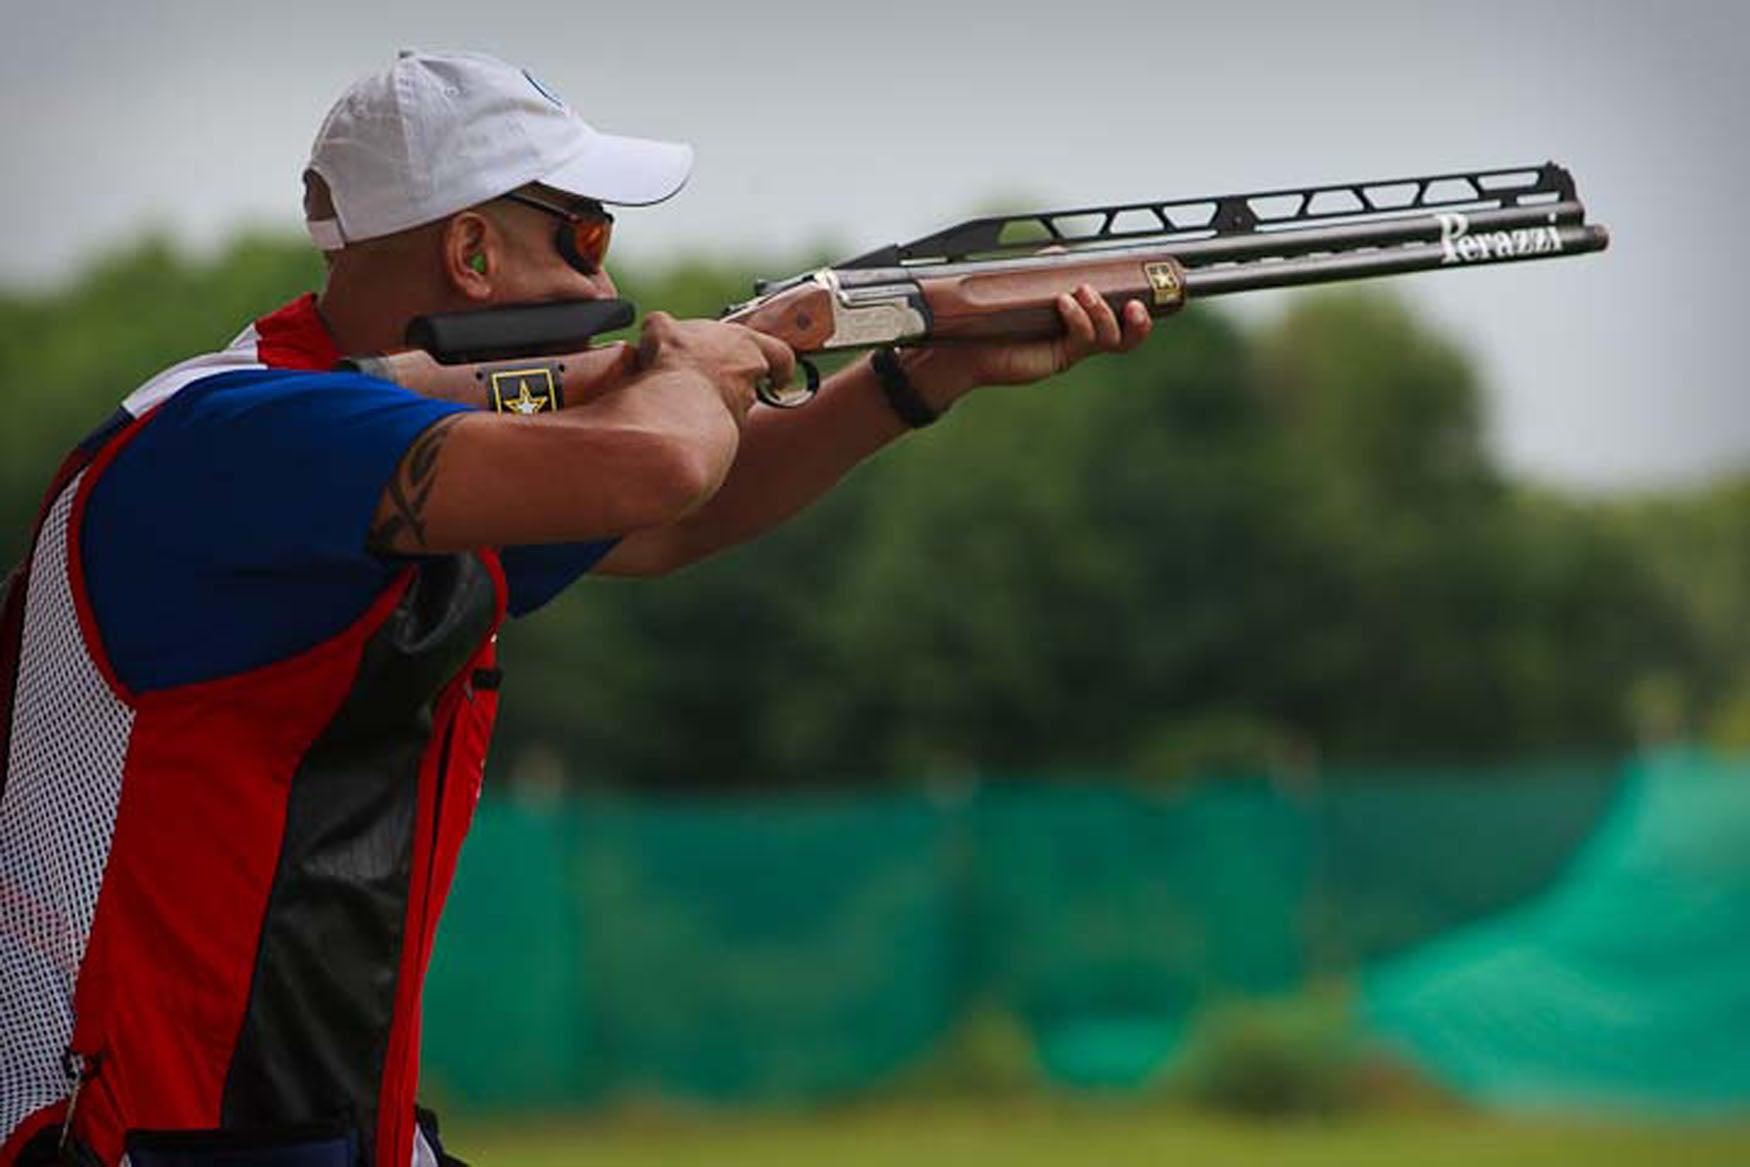 us army marksmanship unit soldier